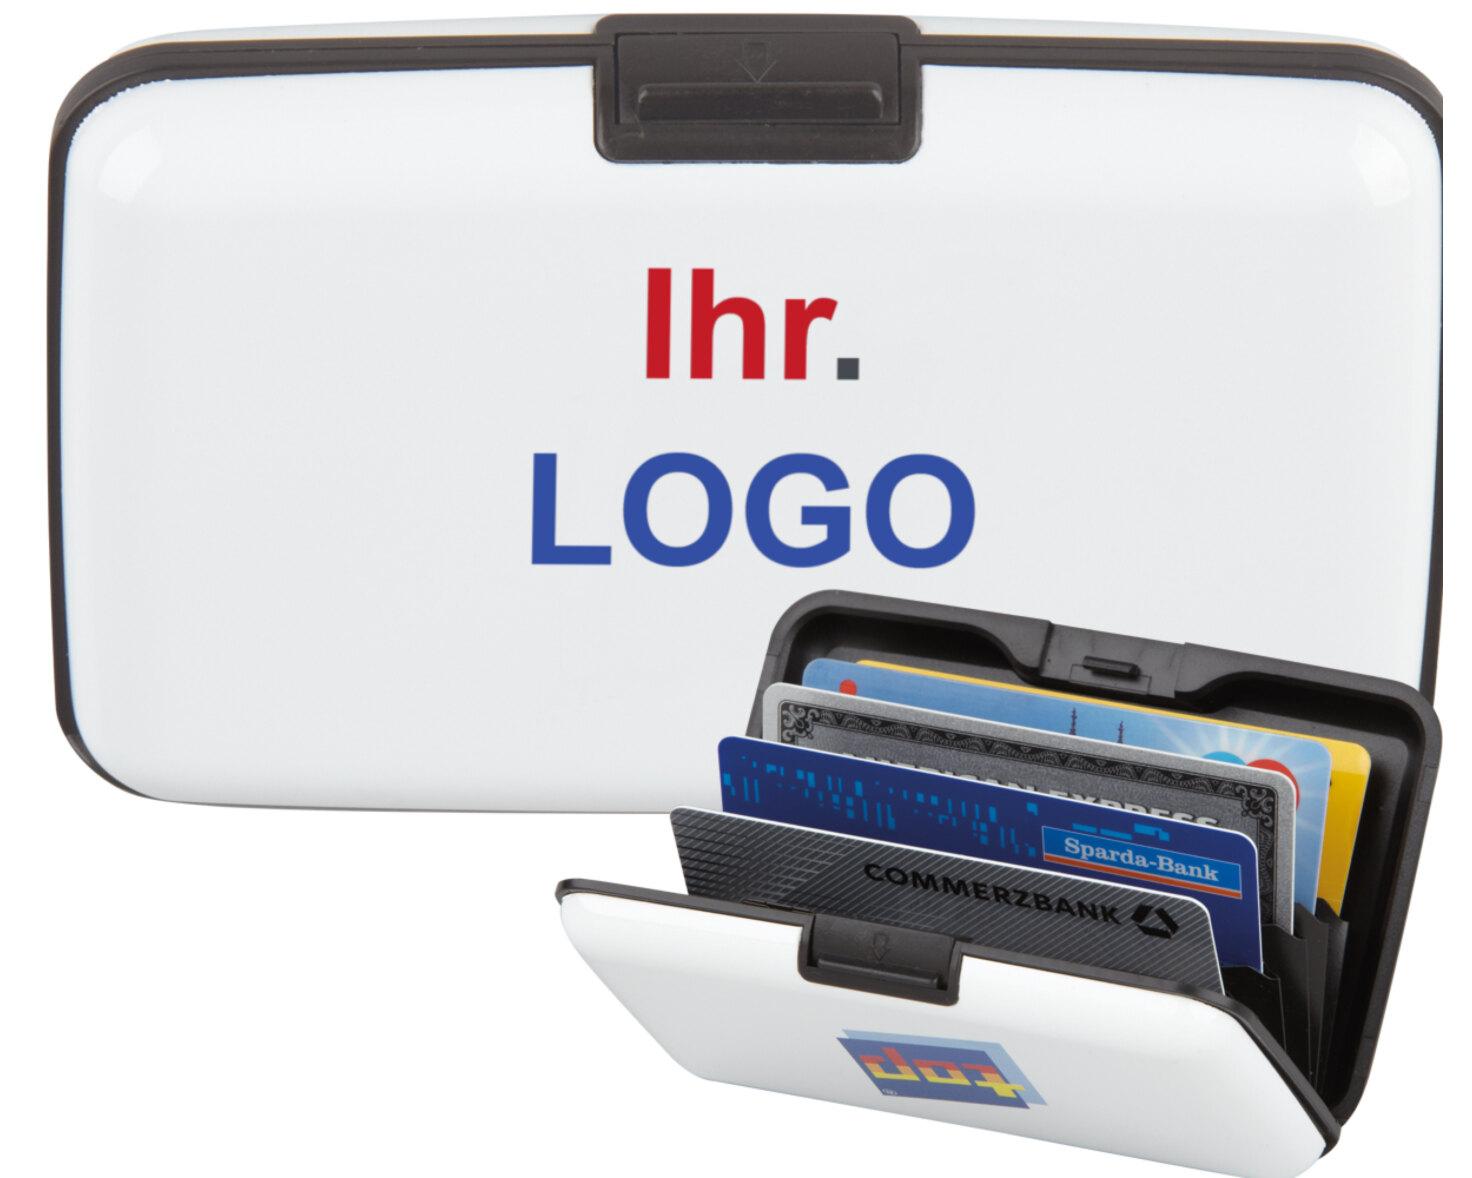 Kreditkarten-Box